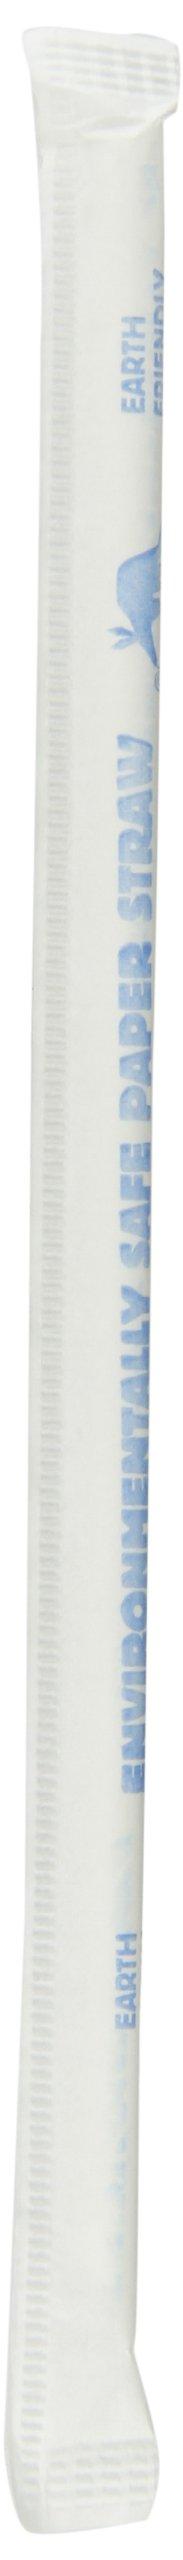 Aardvark 61500207 Wrapped Paper Jumbo Drinking Straw, 7/32'' Diameter x 7-3/4'' Length, White (8 Boxes of 400)